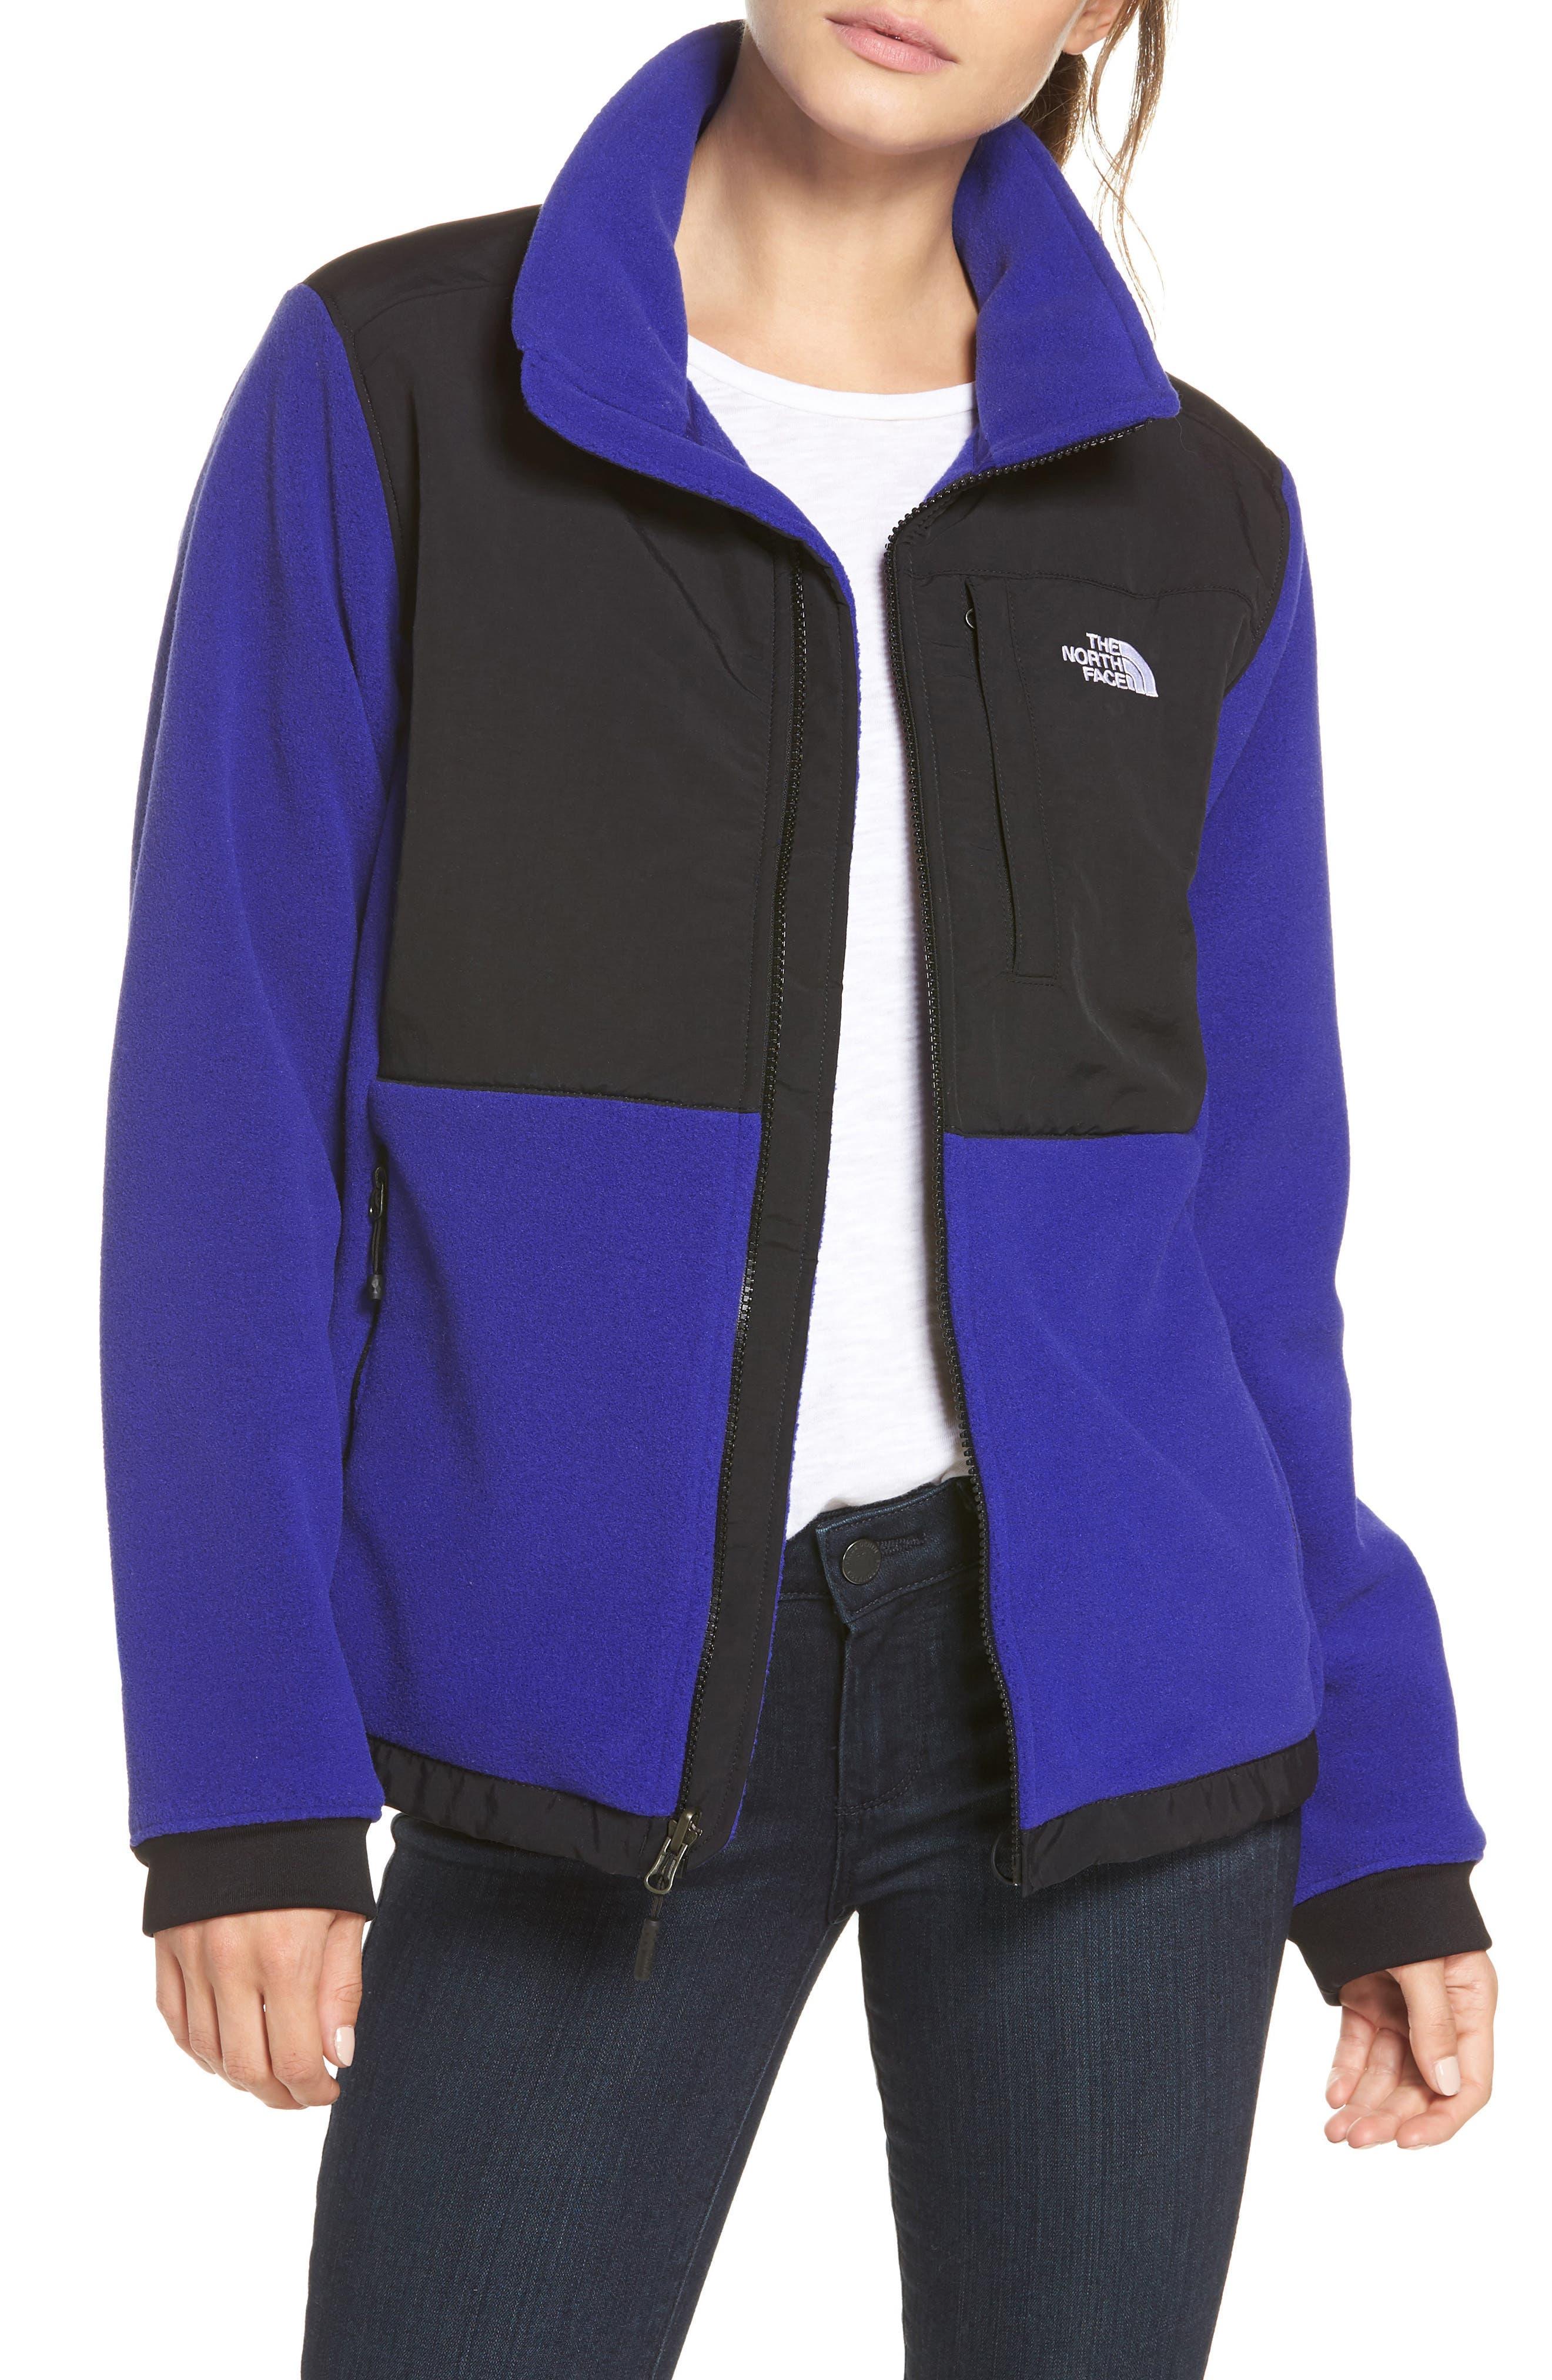 Denali 2 Jacket,                         Main,                         color, LAPIS BLUE/ TNF BLACK